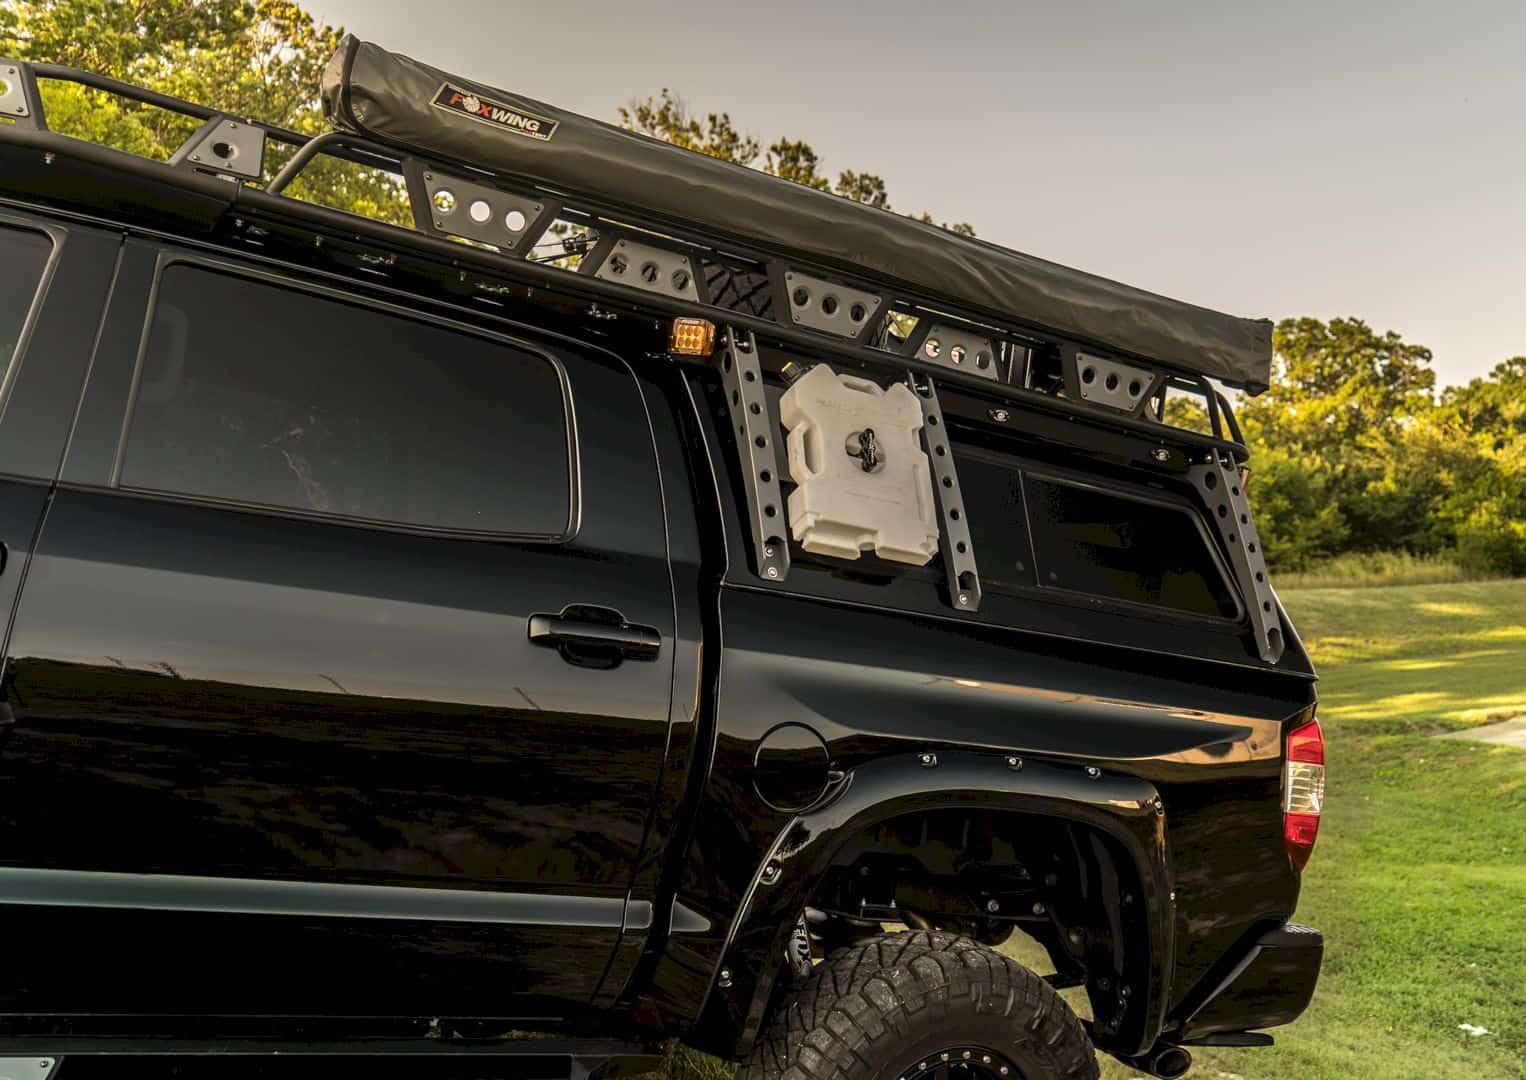 Toyota X Kevin Costner Tundra Platinum 1